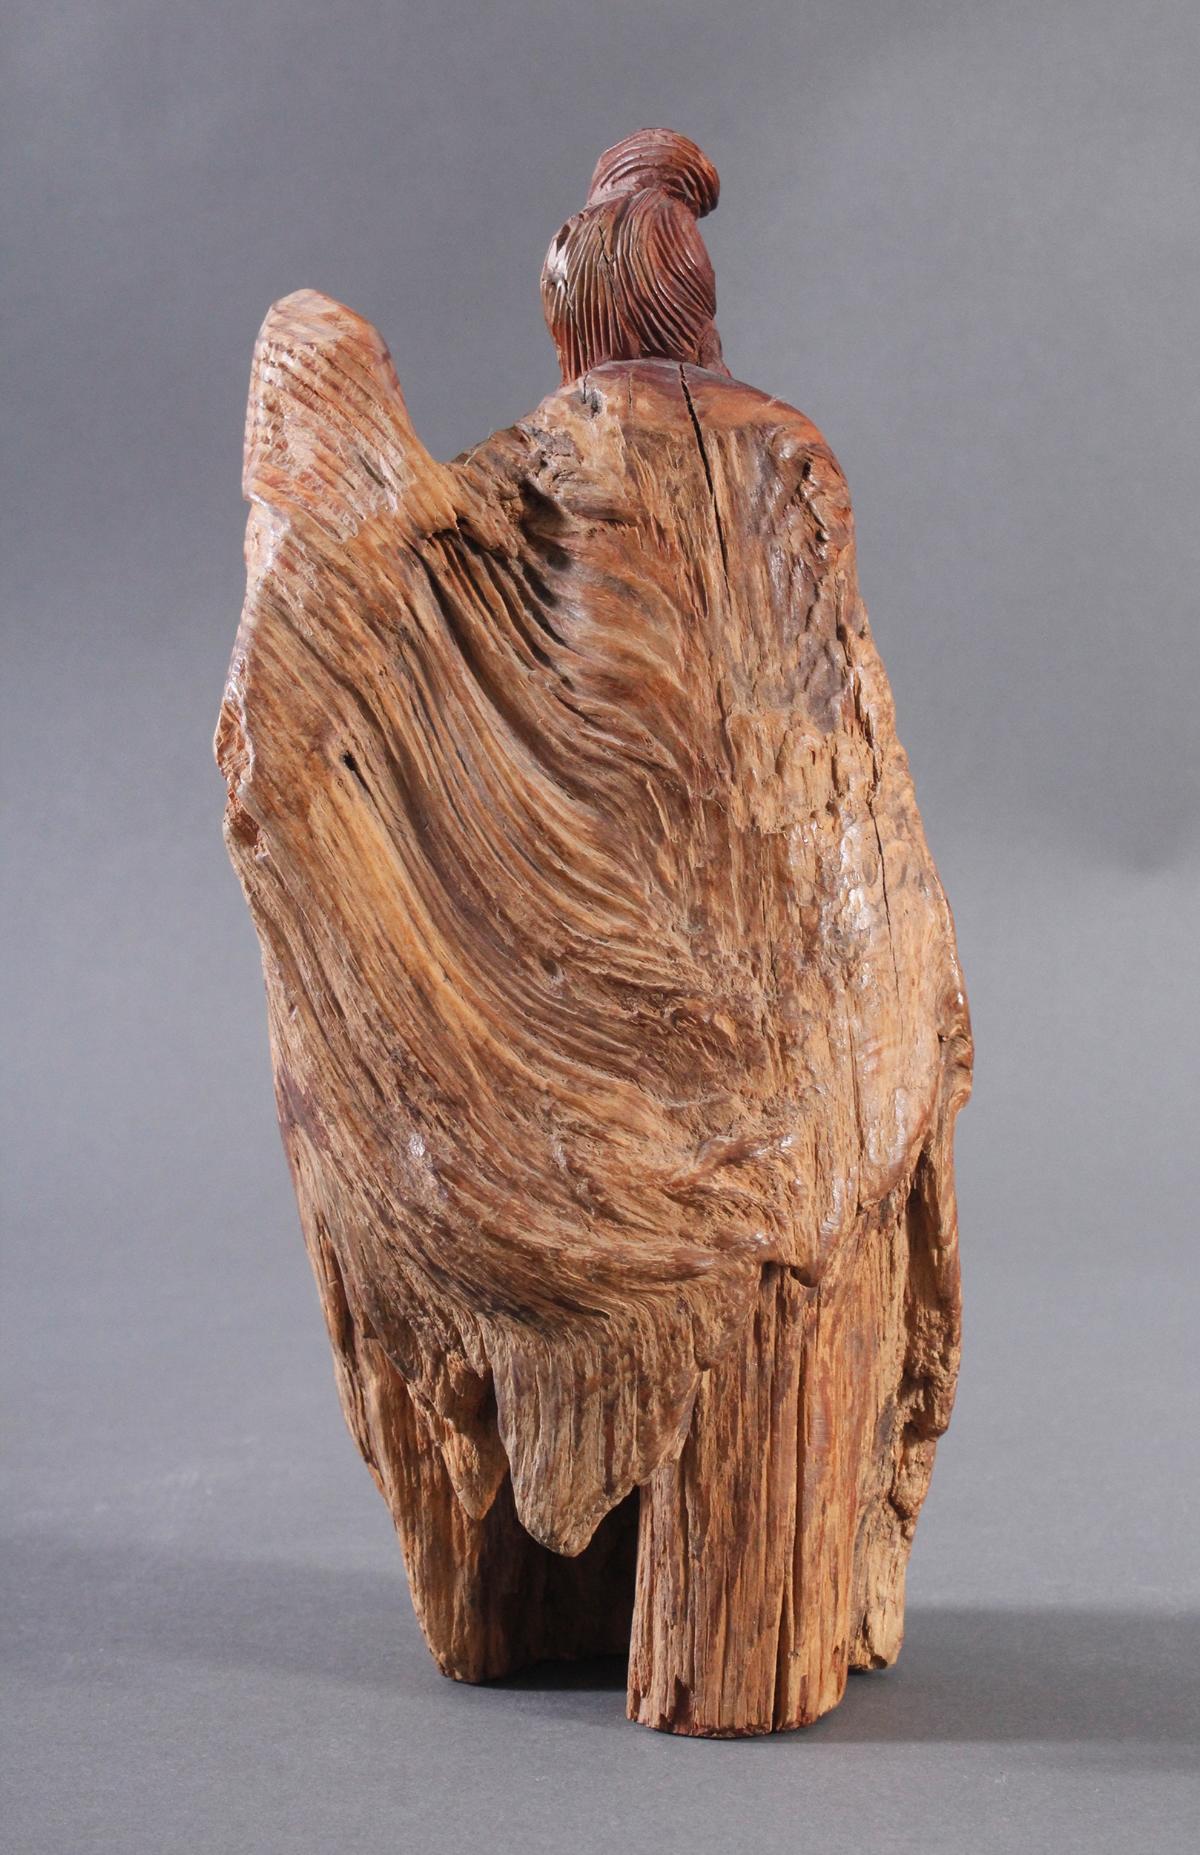 Holzskulptur, China 2. Hälfte 20. Jh. Mann mit Bart-2